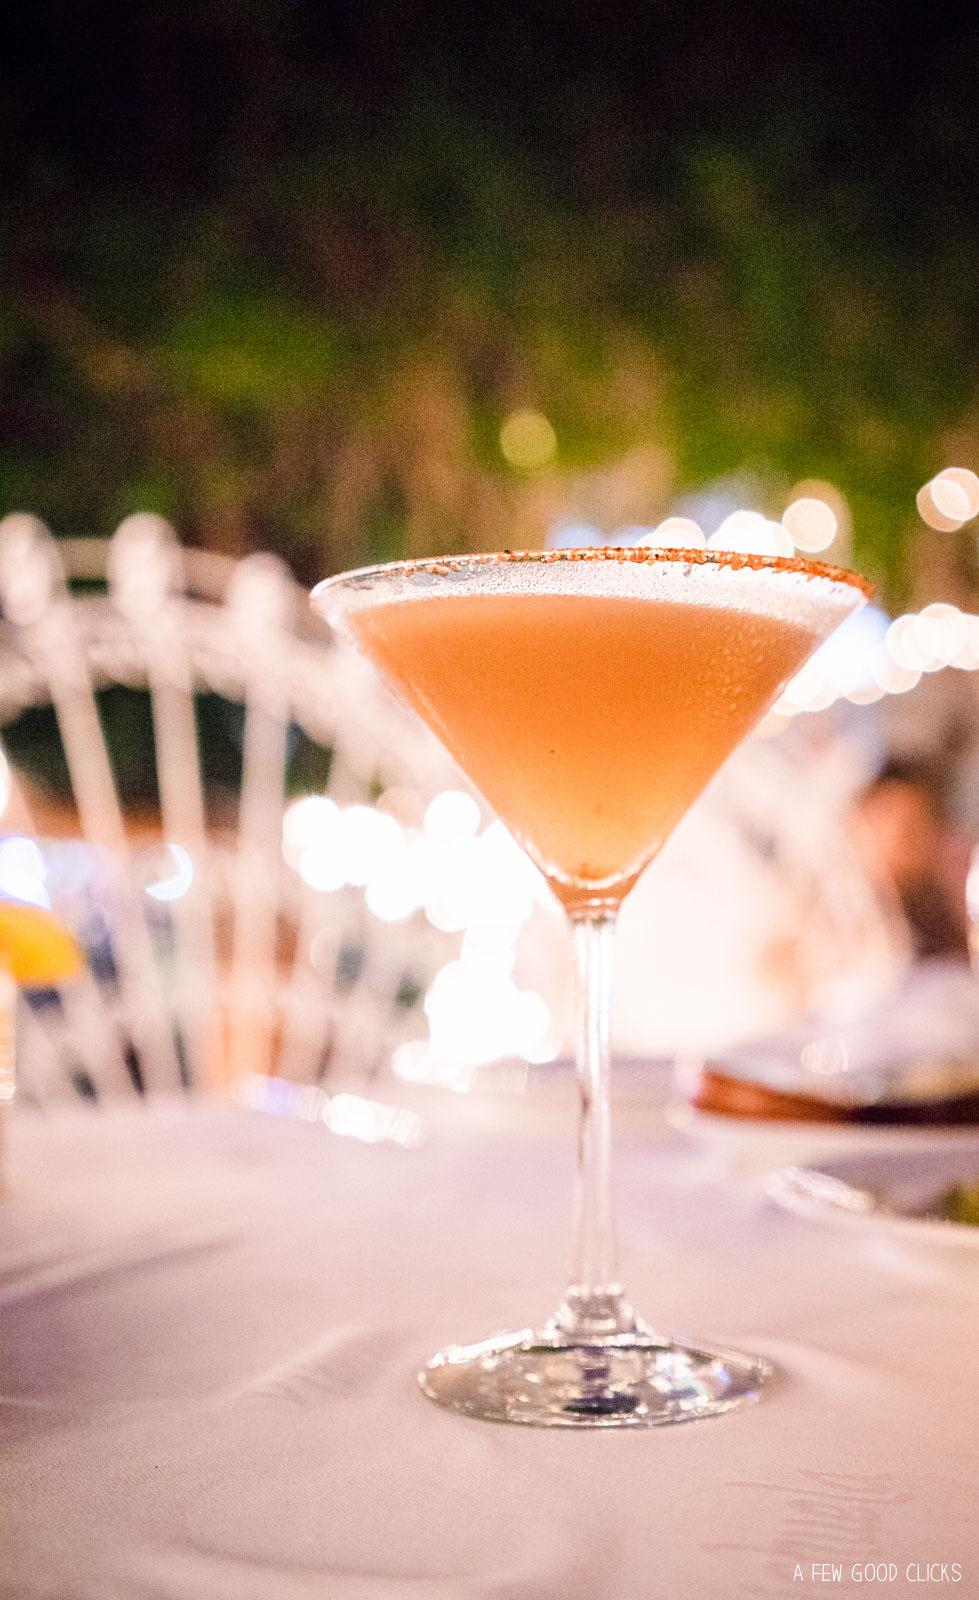 cancun-la-habichuela-restaurant-photography-by-a-few-good-clicks-net-1-40.jpg